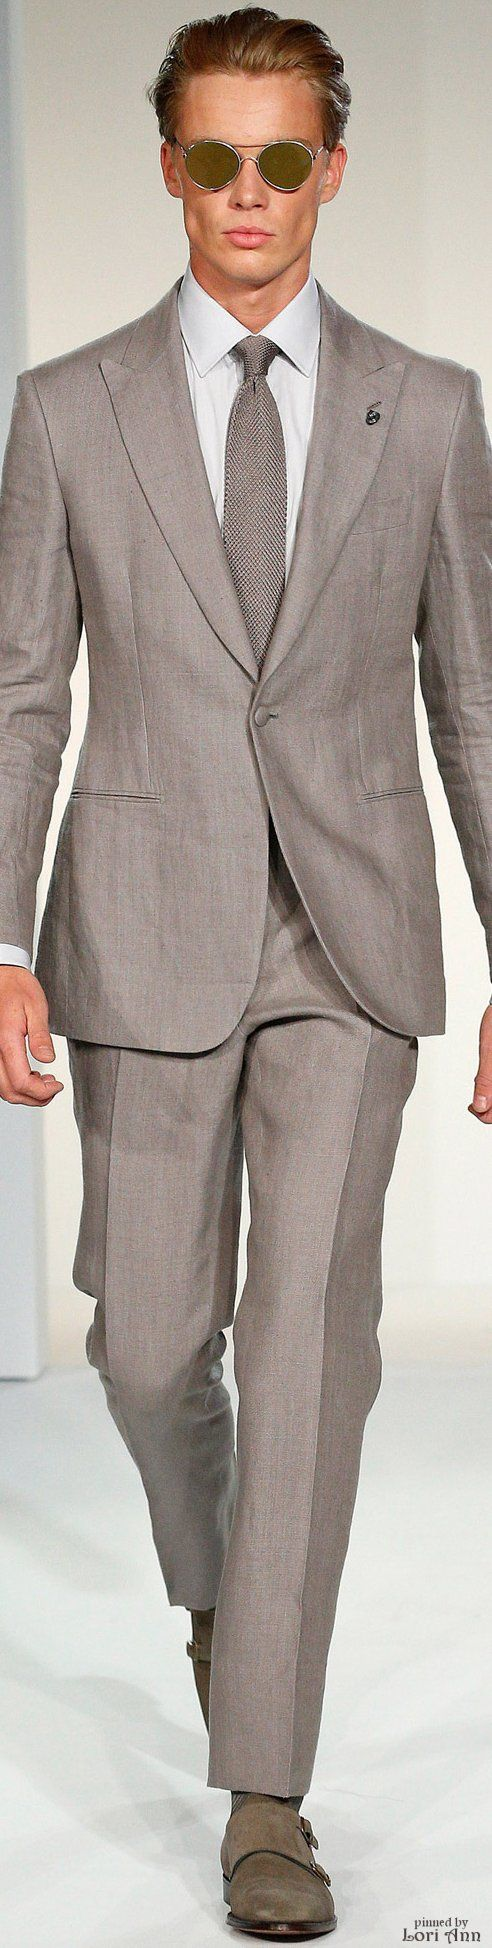 Gieves & Hawkes Spring 2015 Menswear